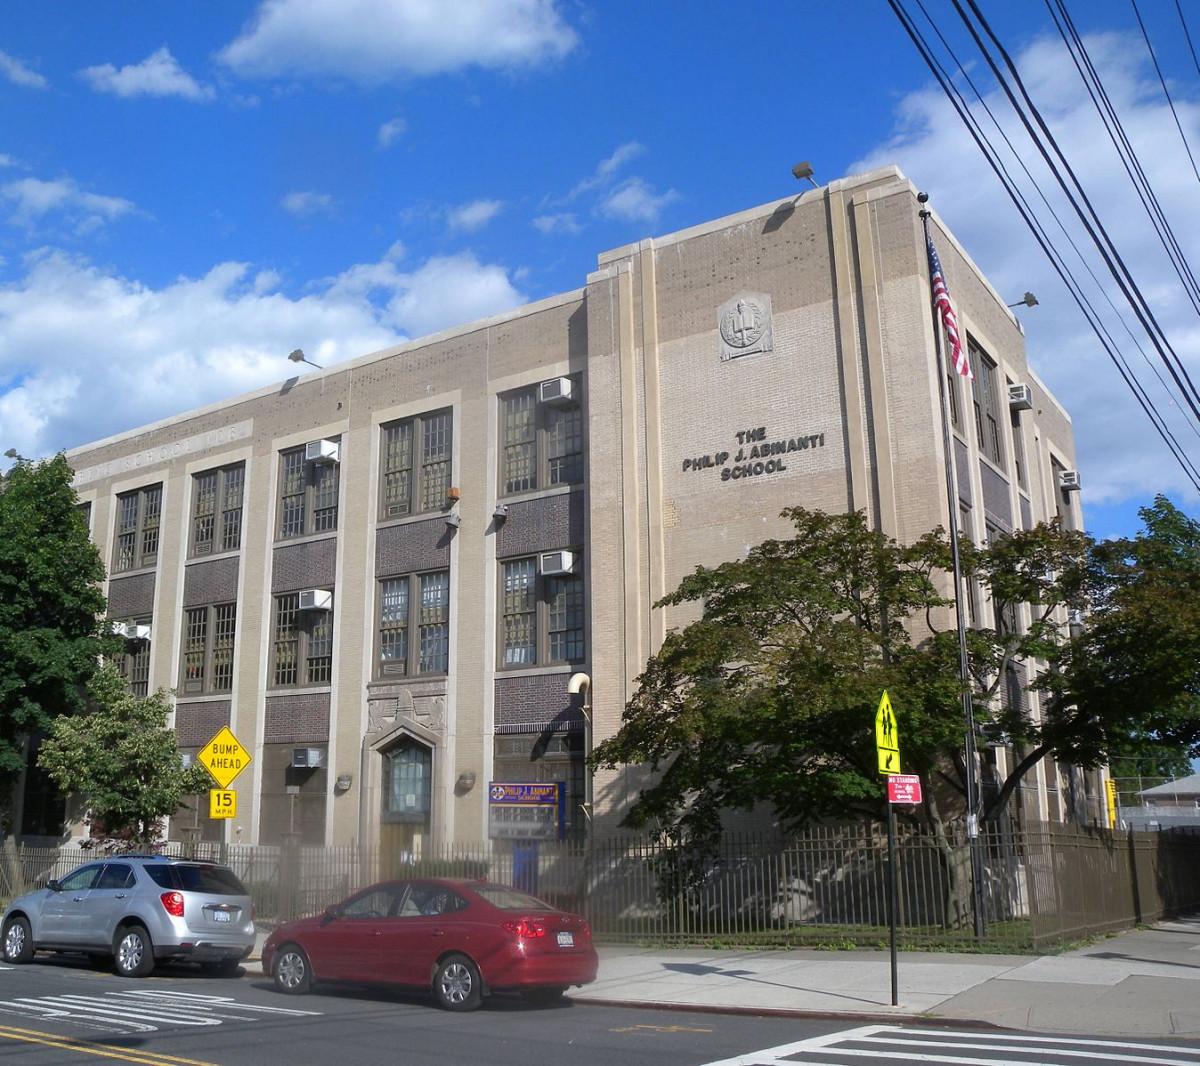 P.S. 108 Philip J. Abinanti School